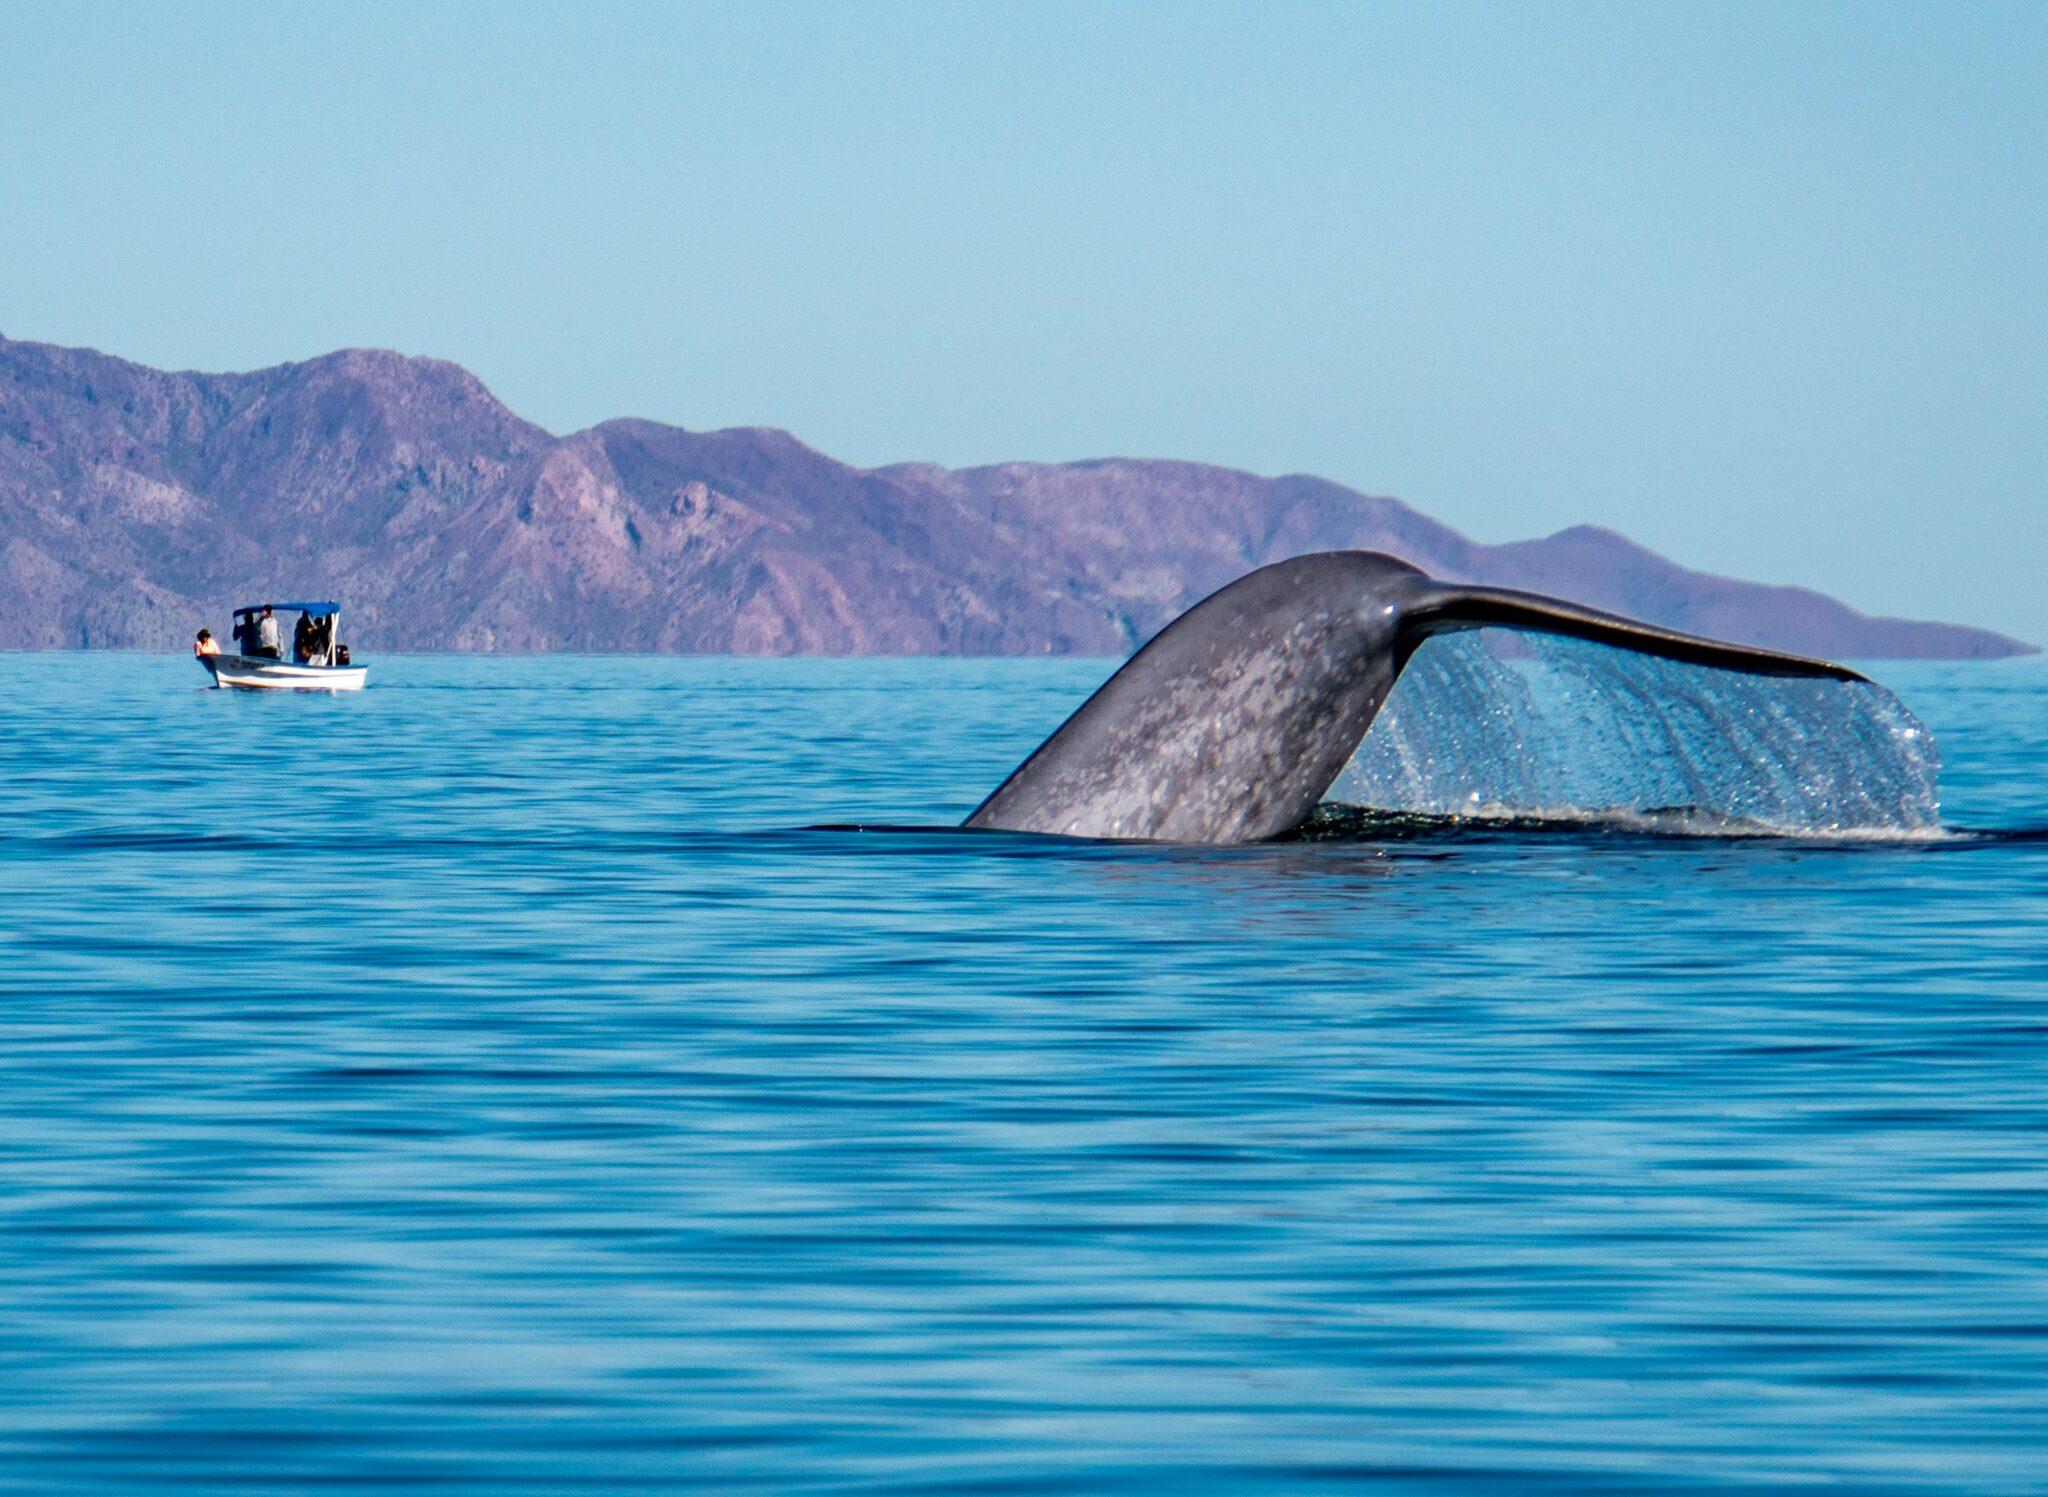 Blue Whale photo courtesy of Dana Jones